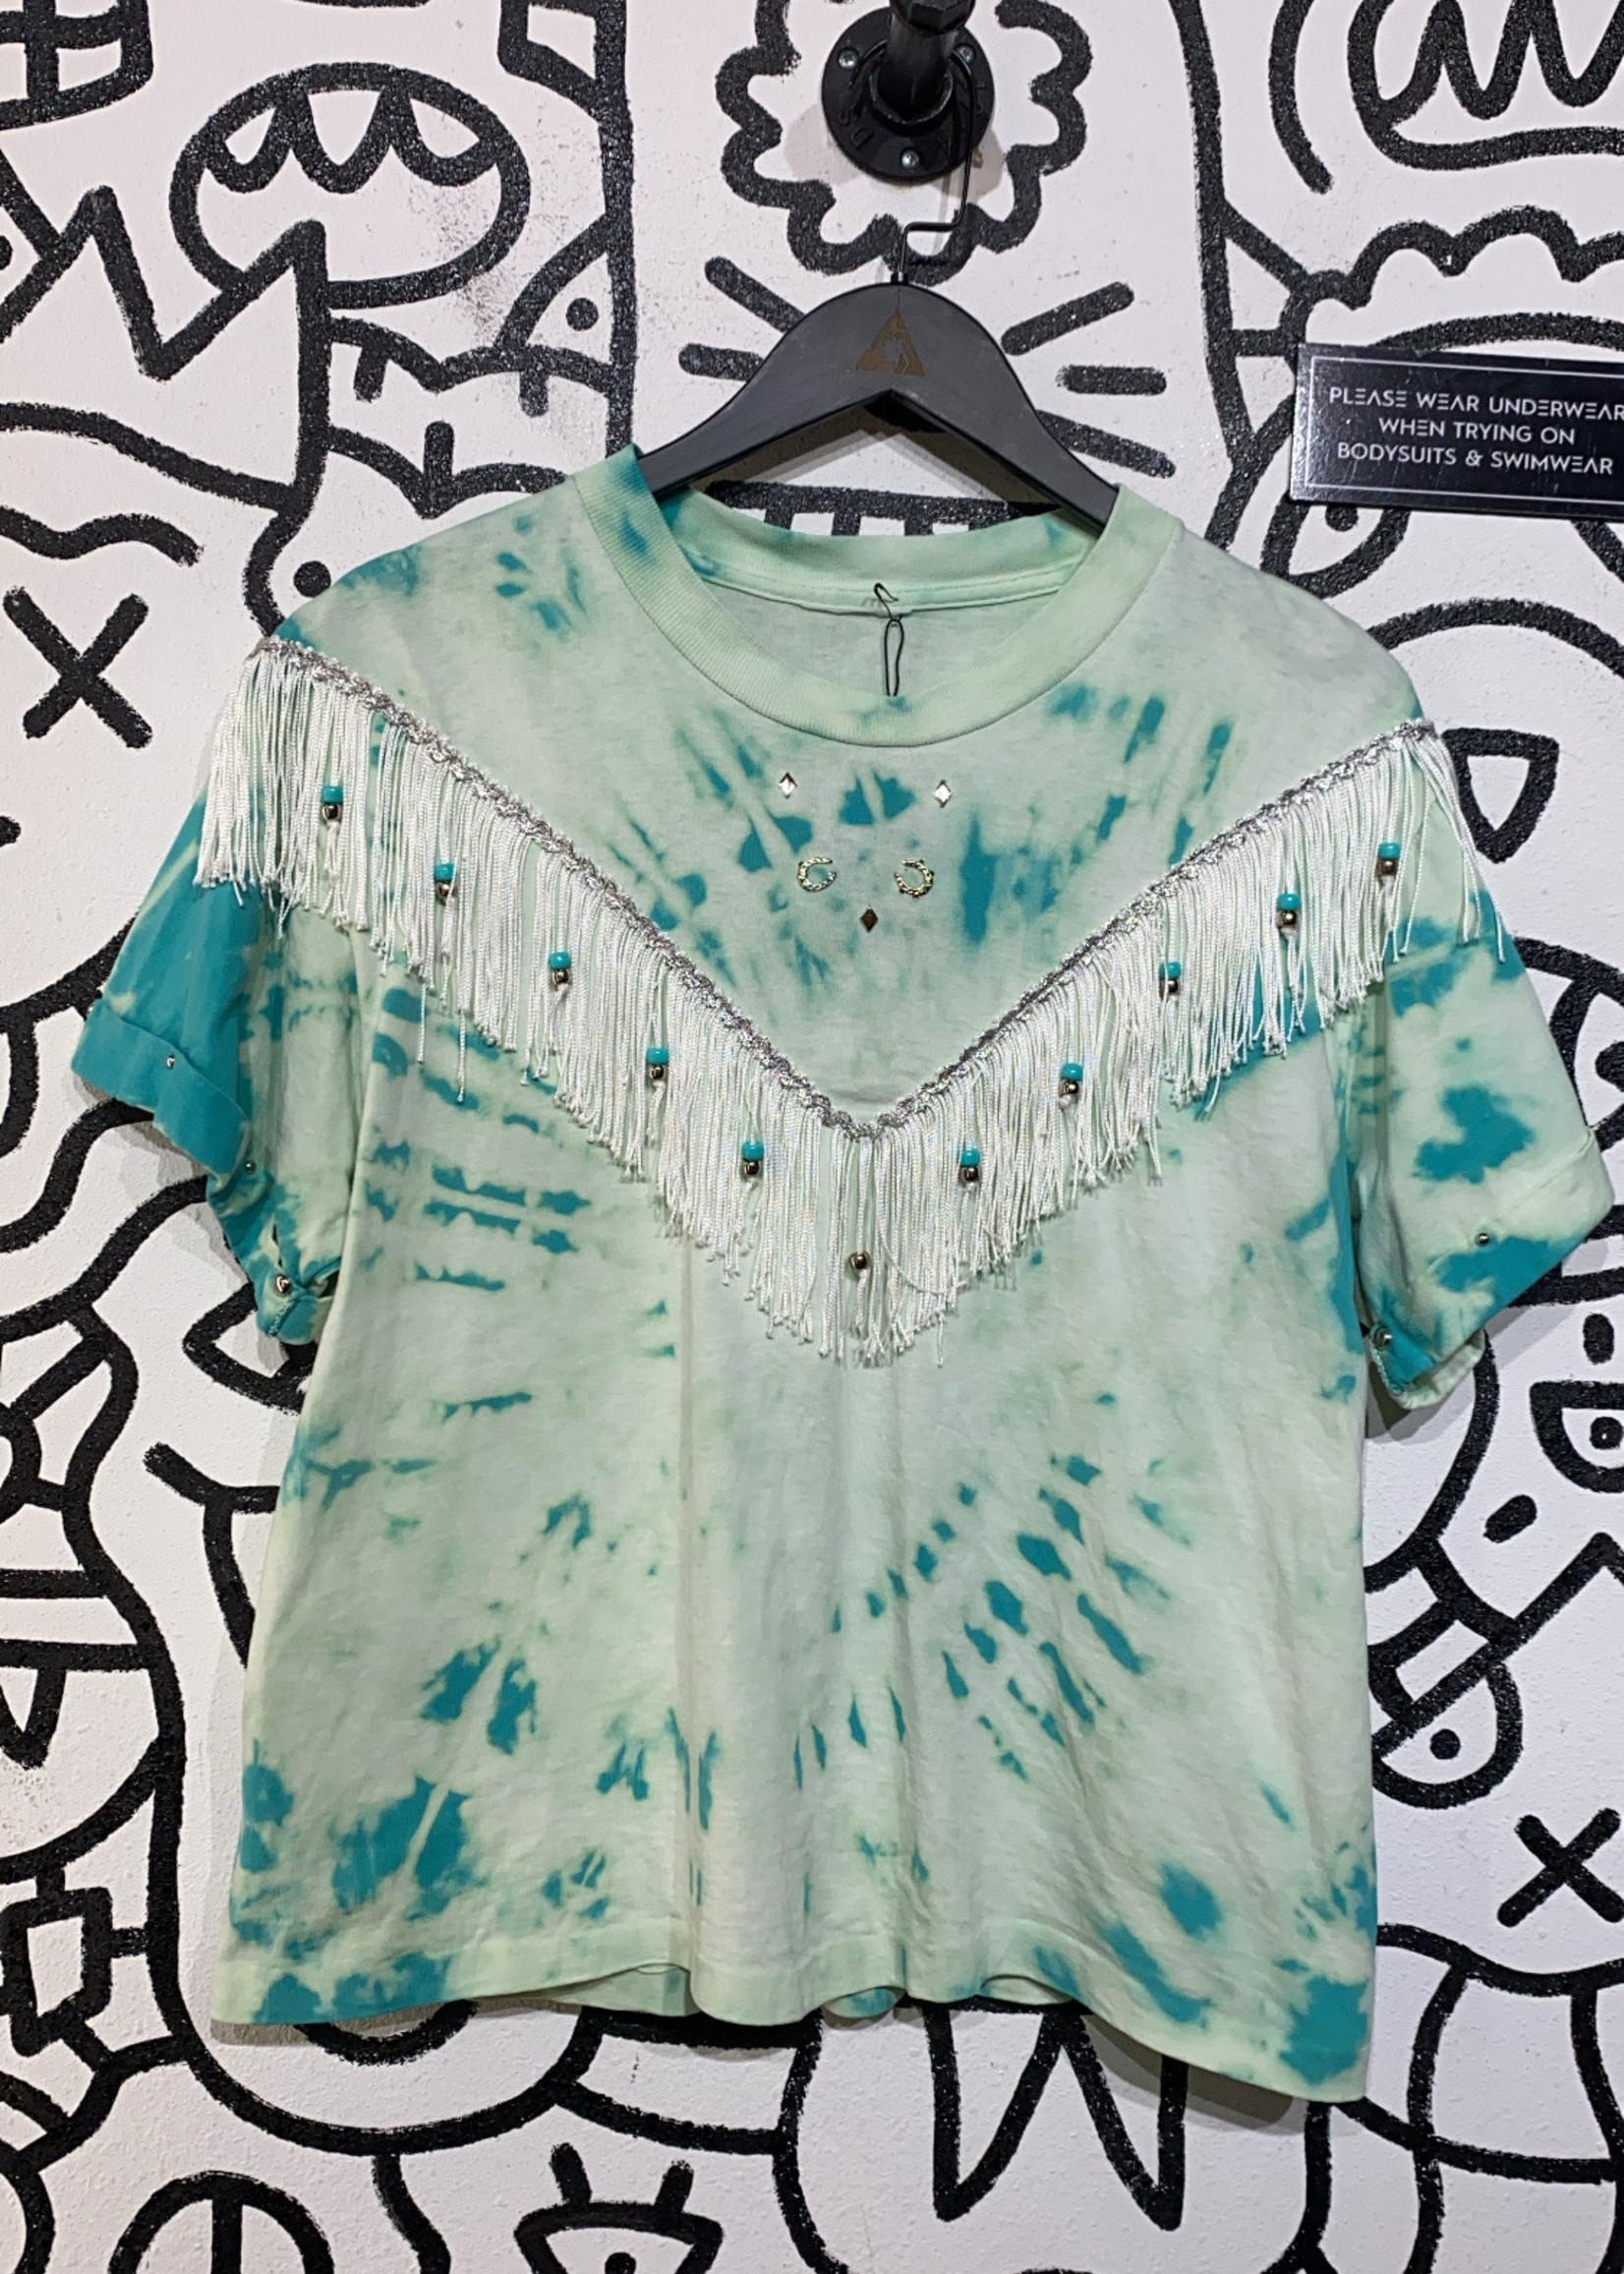 No label Teal Cowgirl tassle shirt M